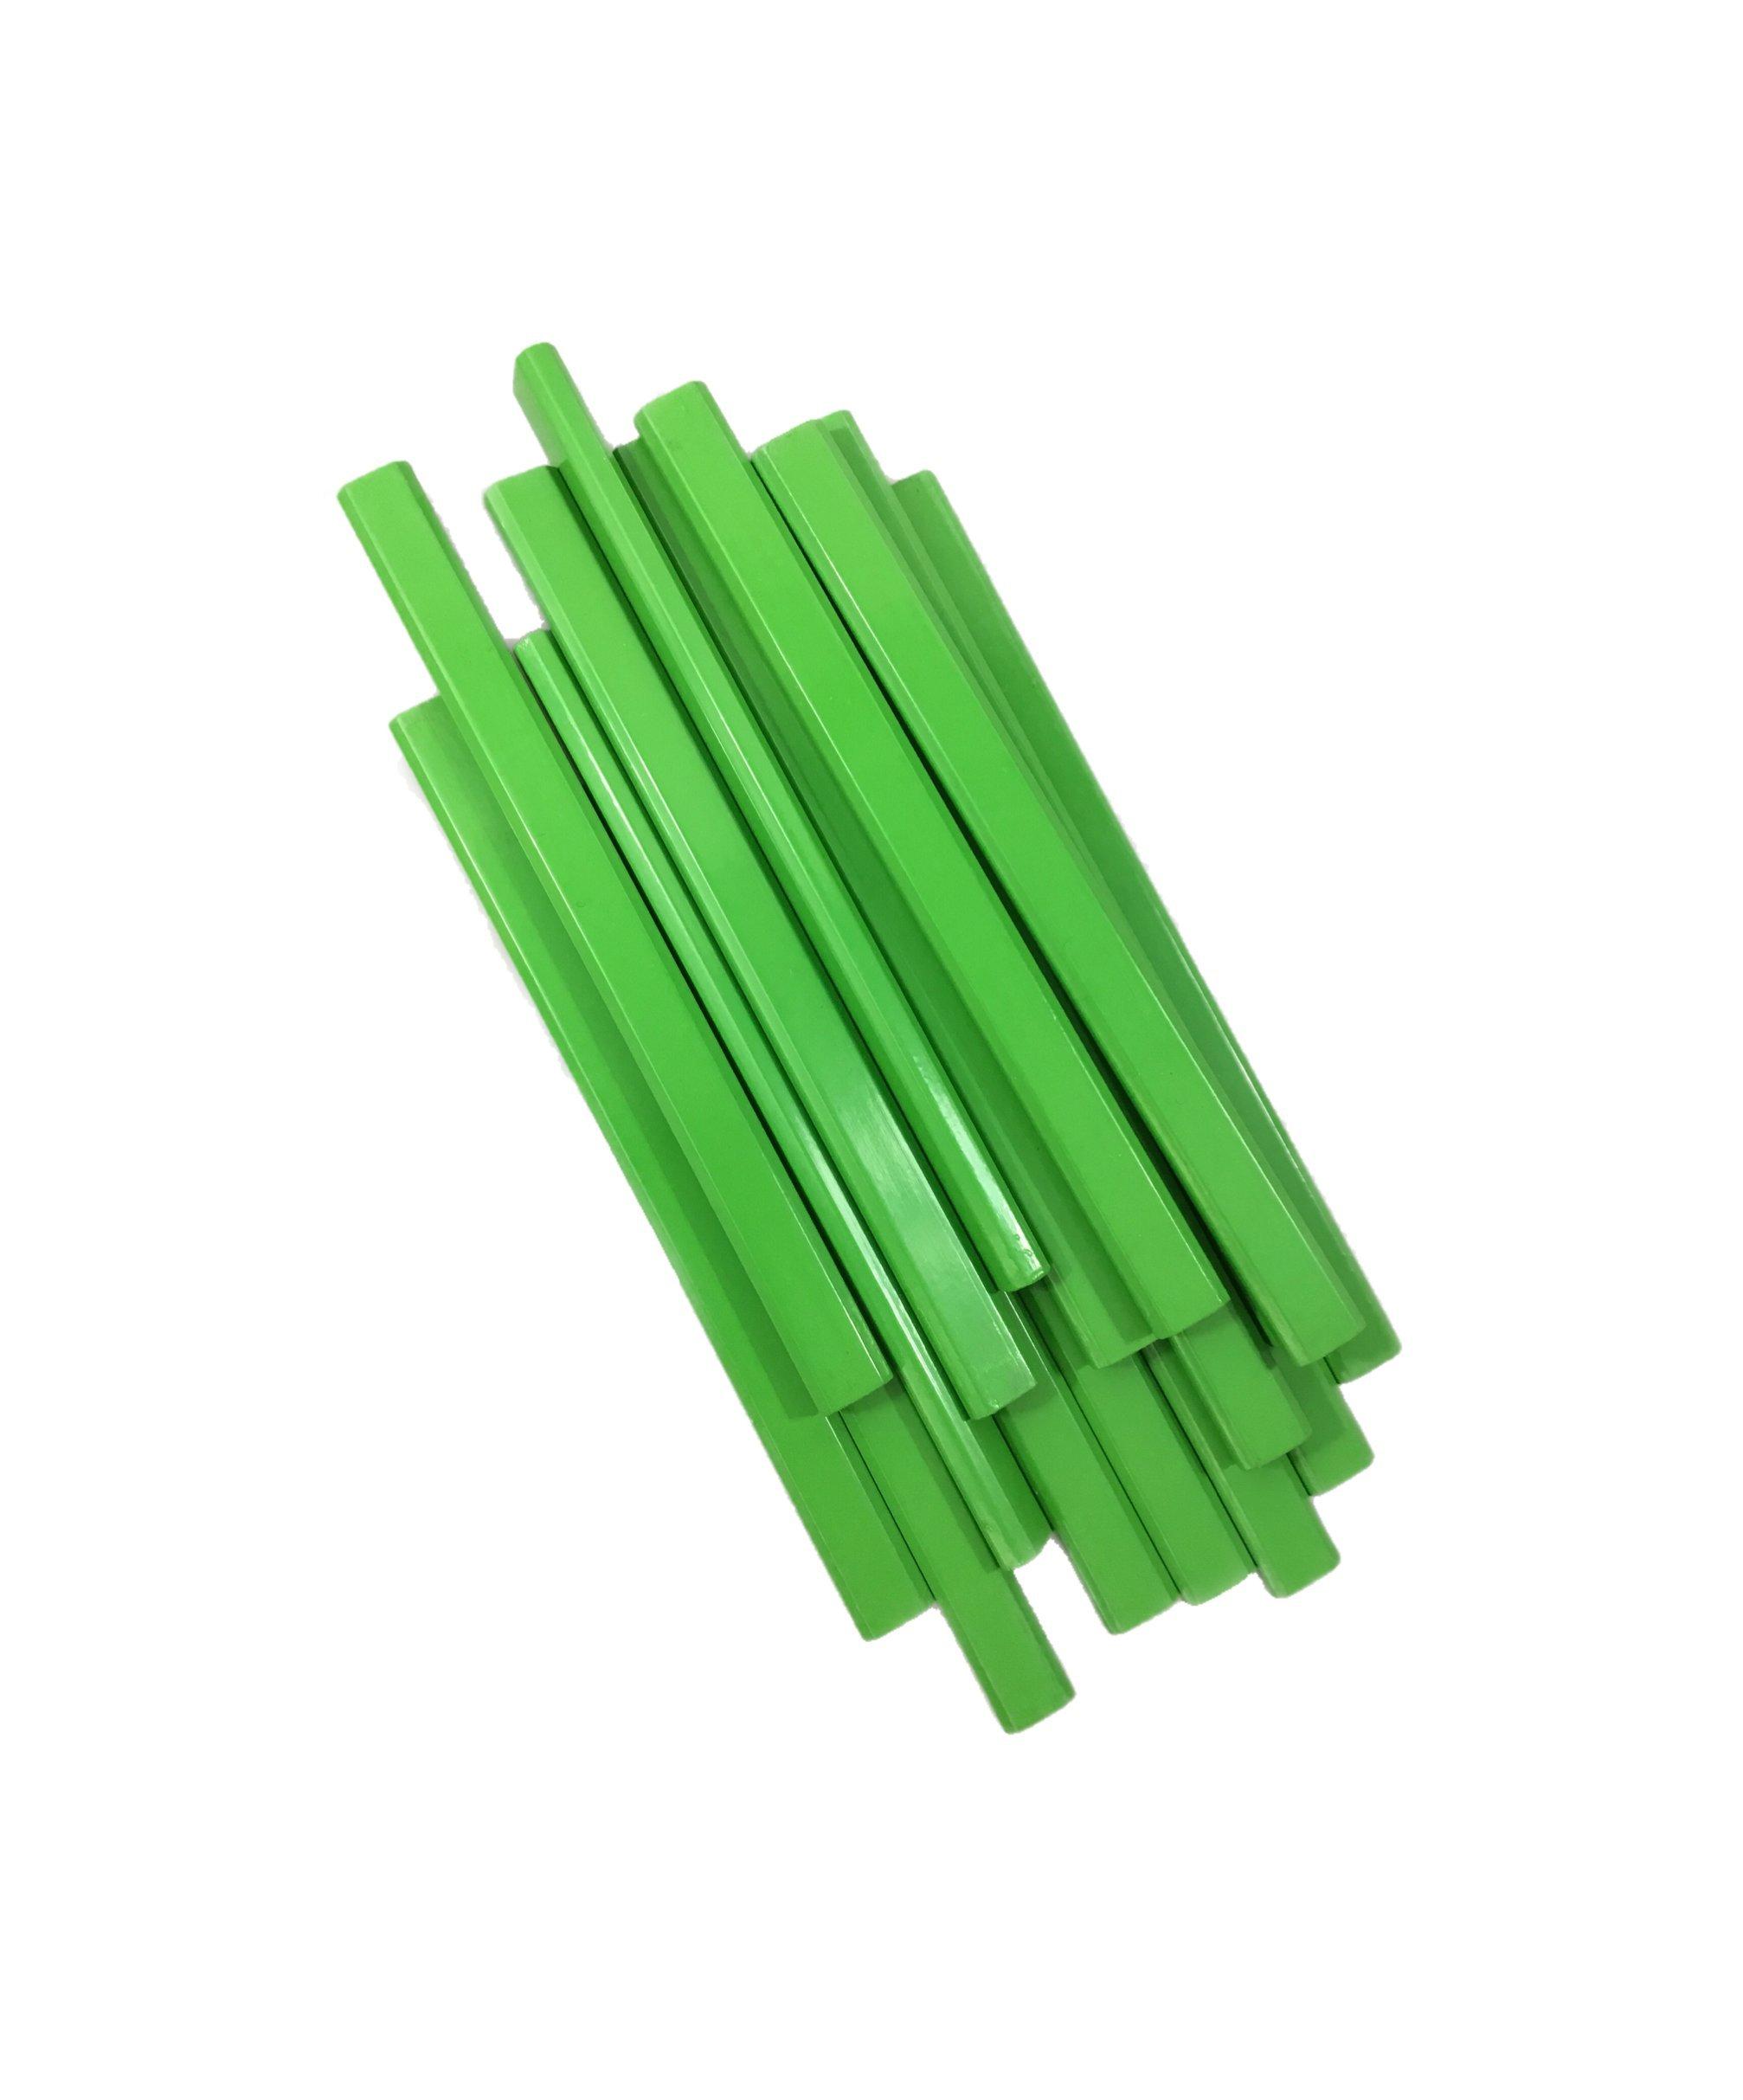 72 Lapices De Carpintero Planos Color Verde Neon